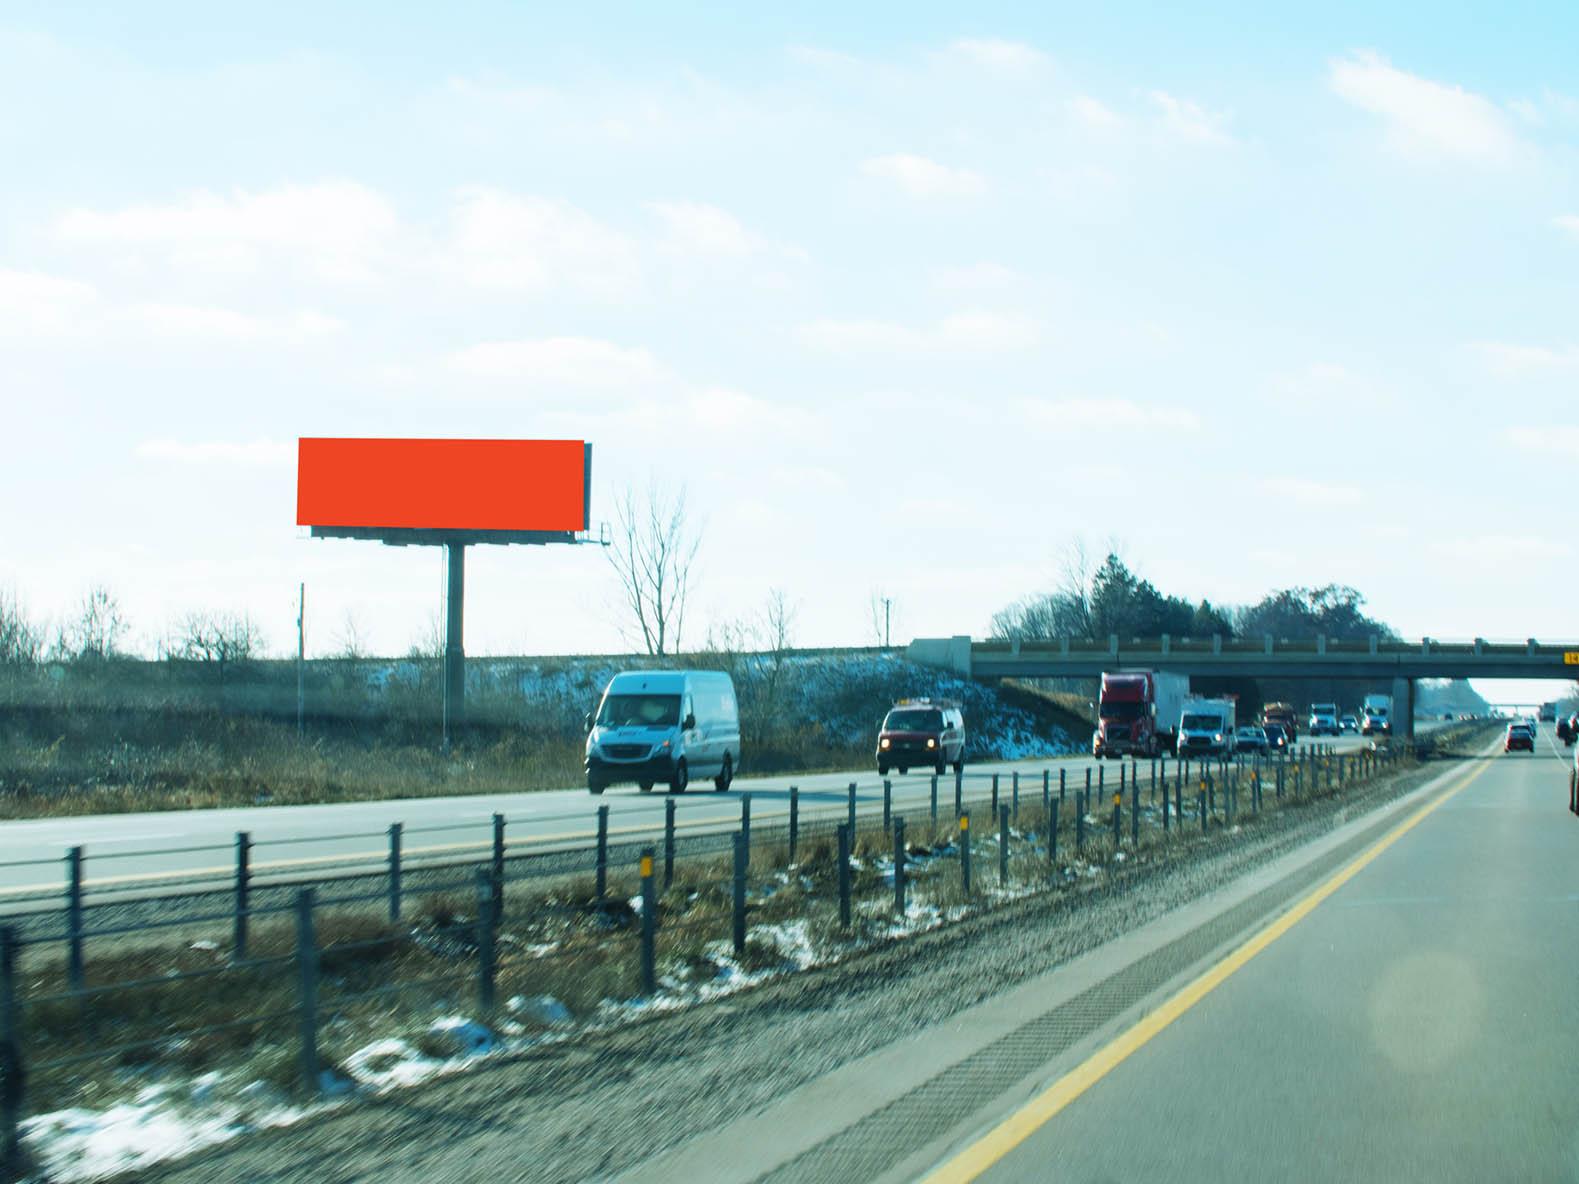 Billboard 101 North (14 x 48) - Geopath: 30655455